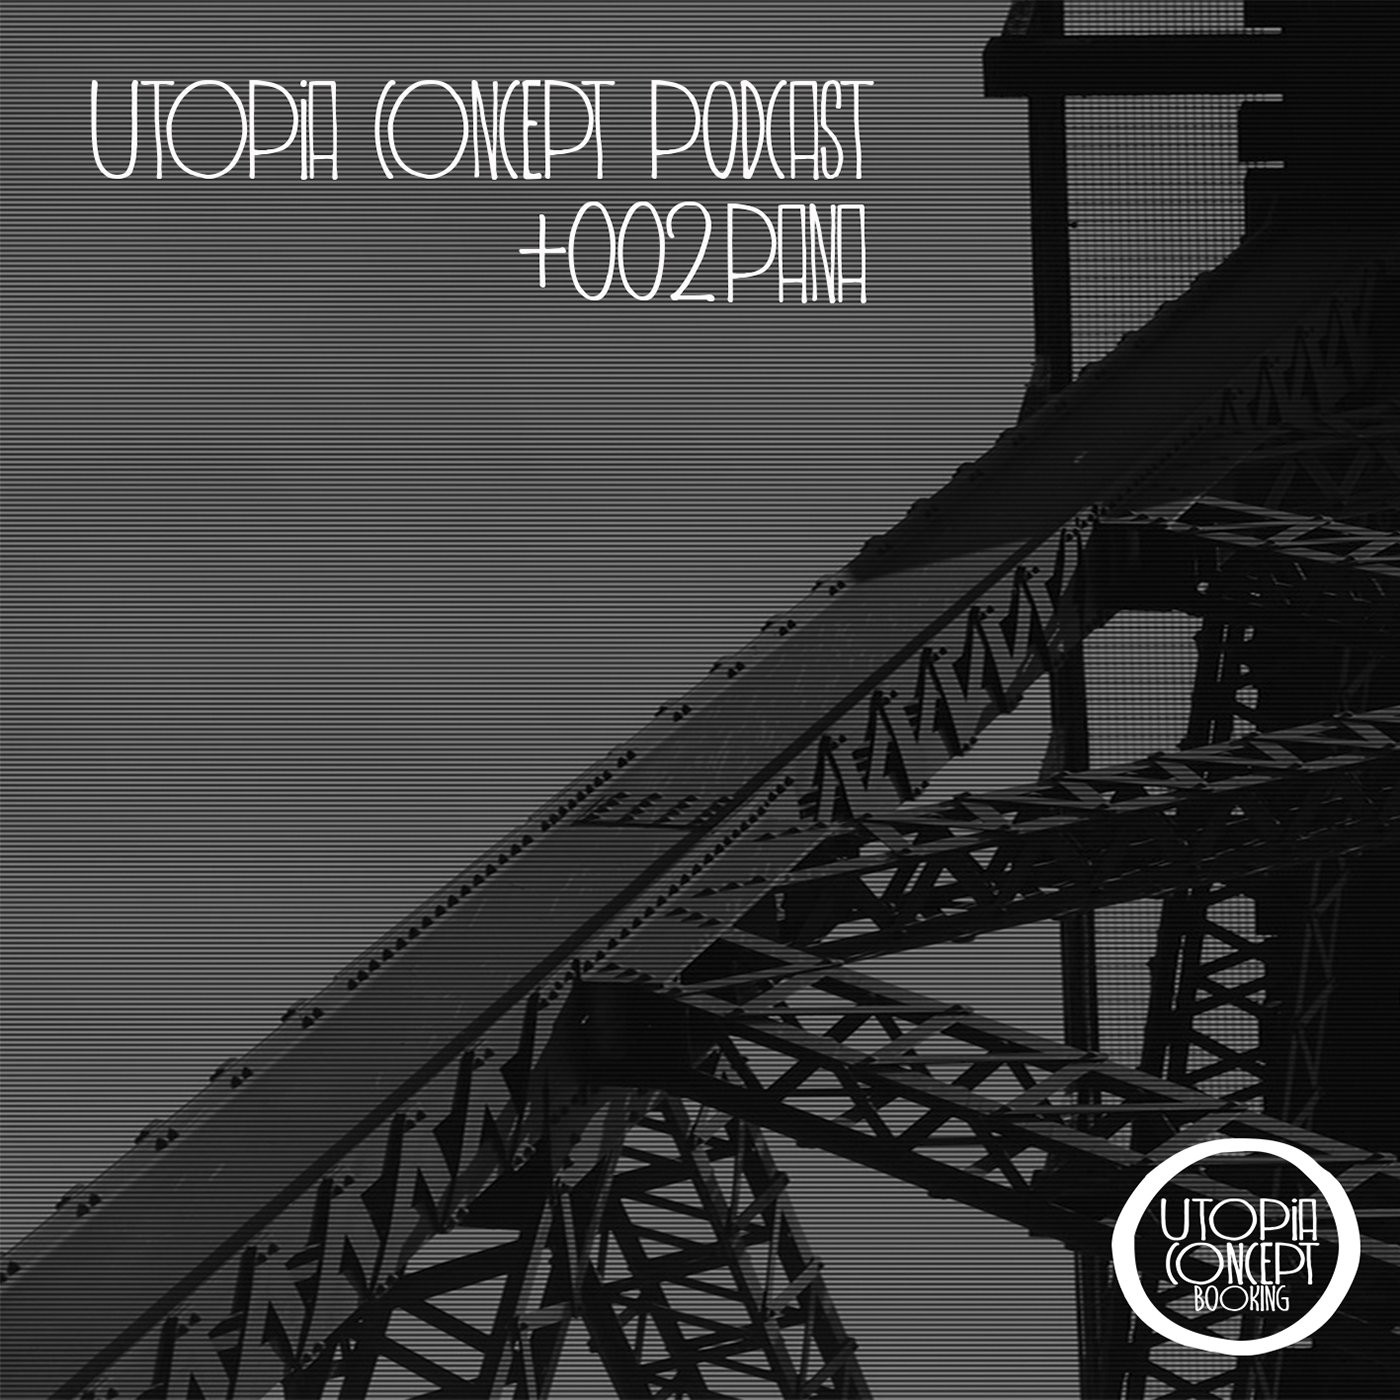 Utopia Concept Podcast 002 - PANA